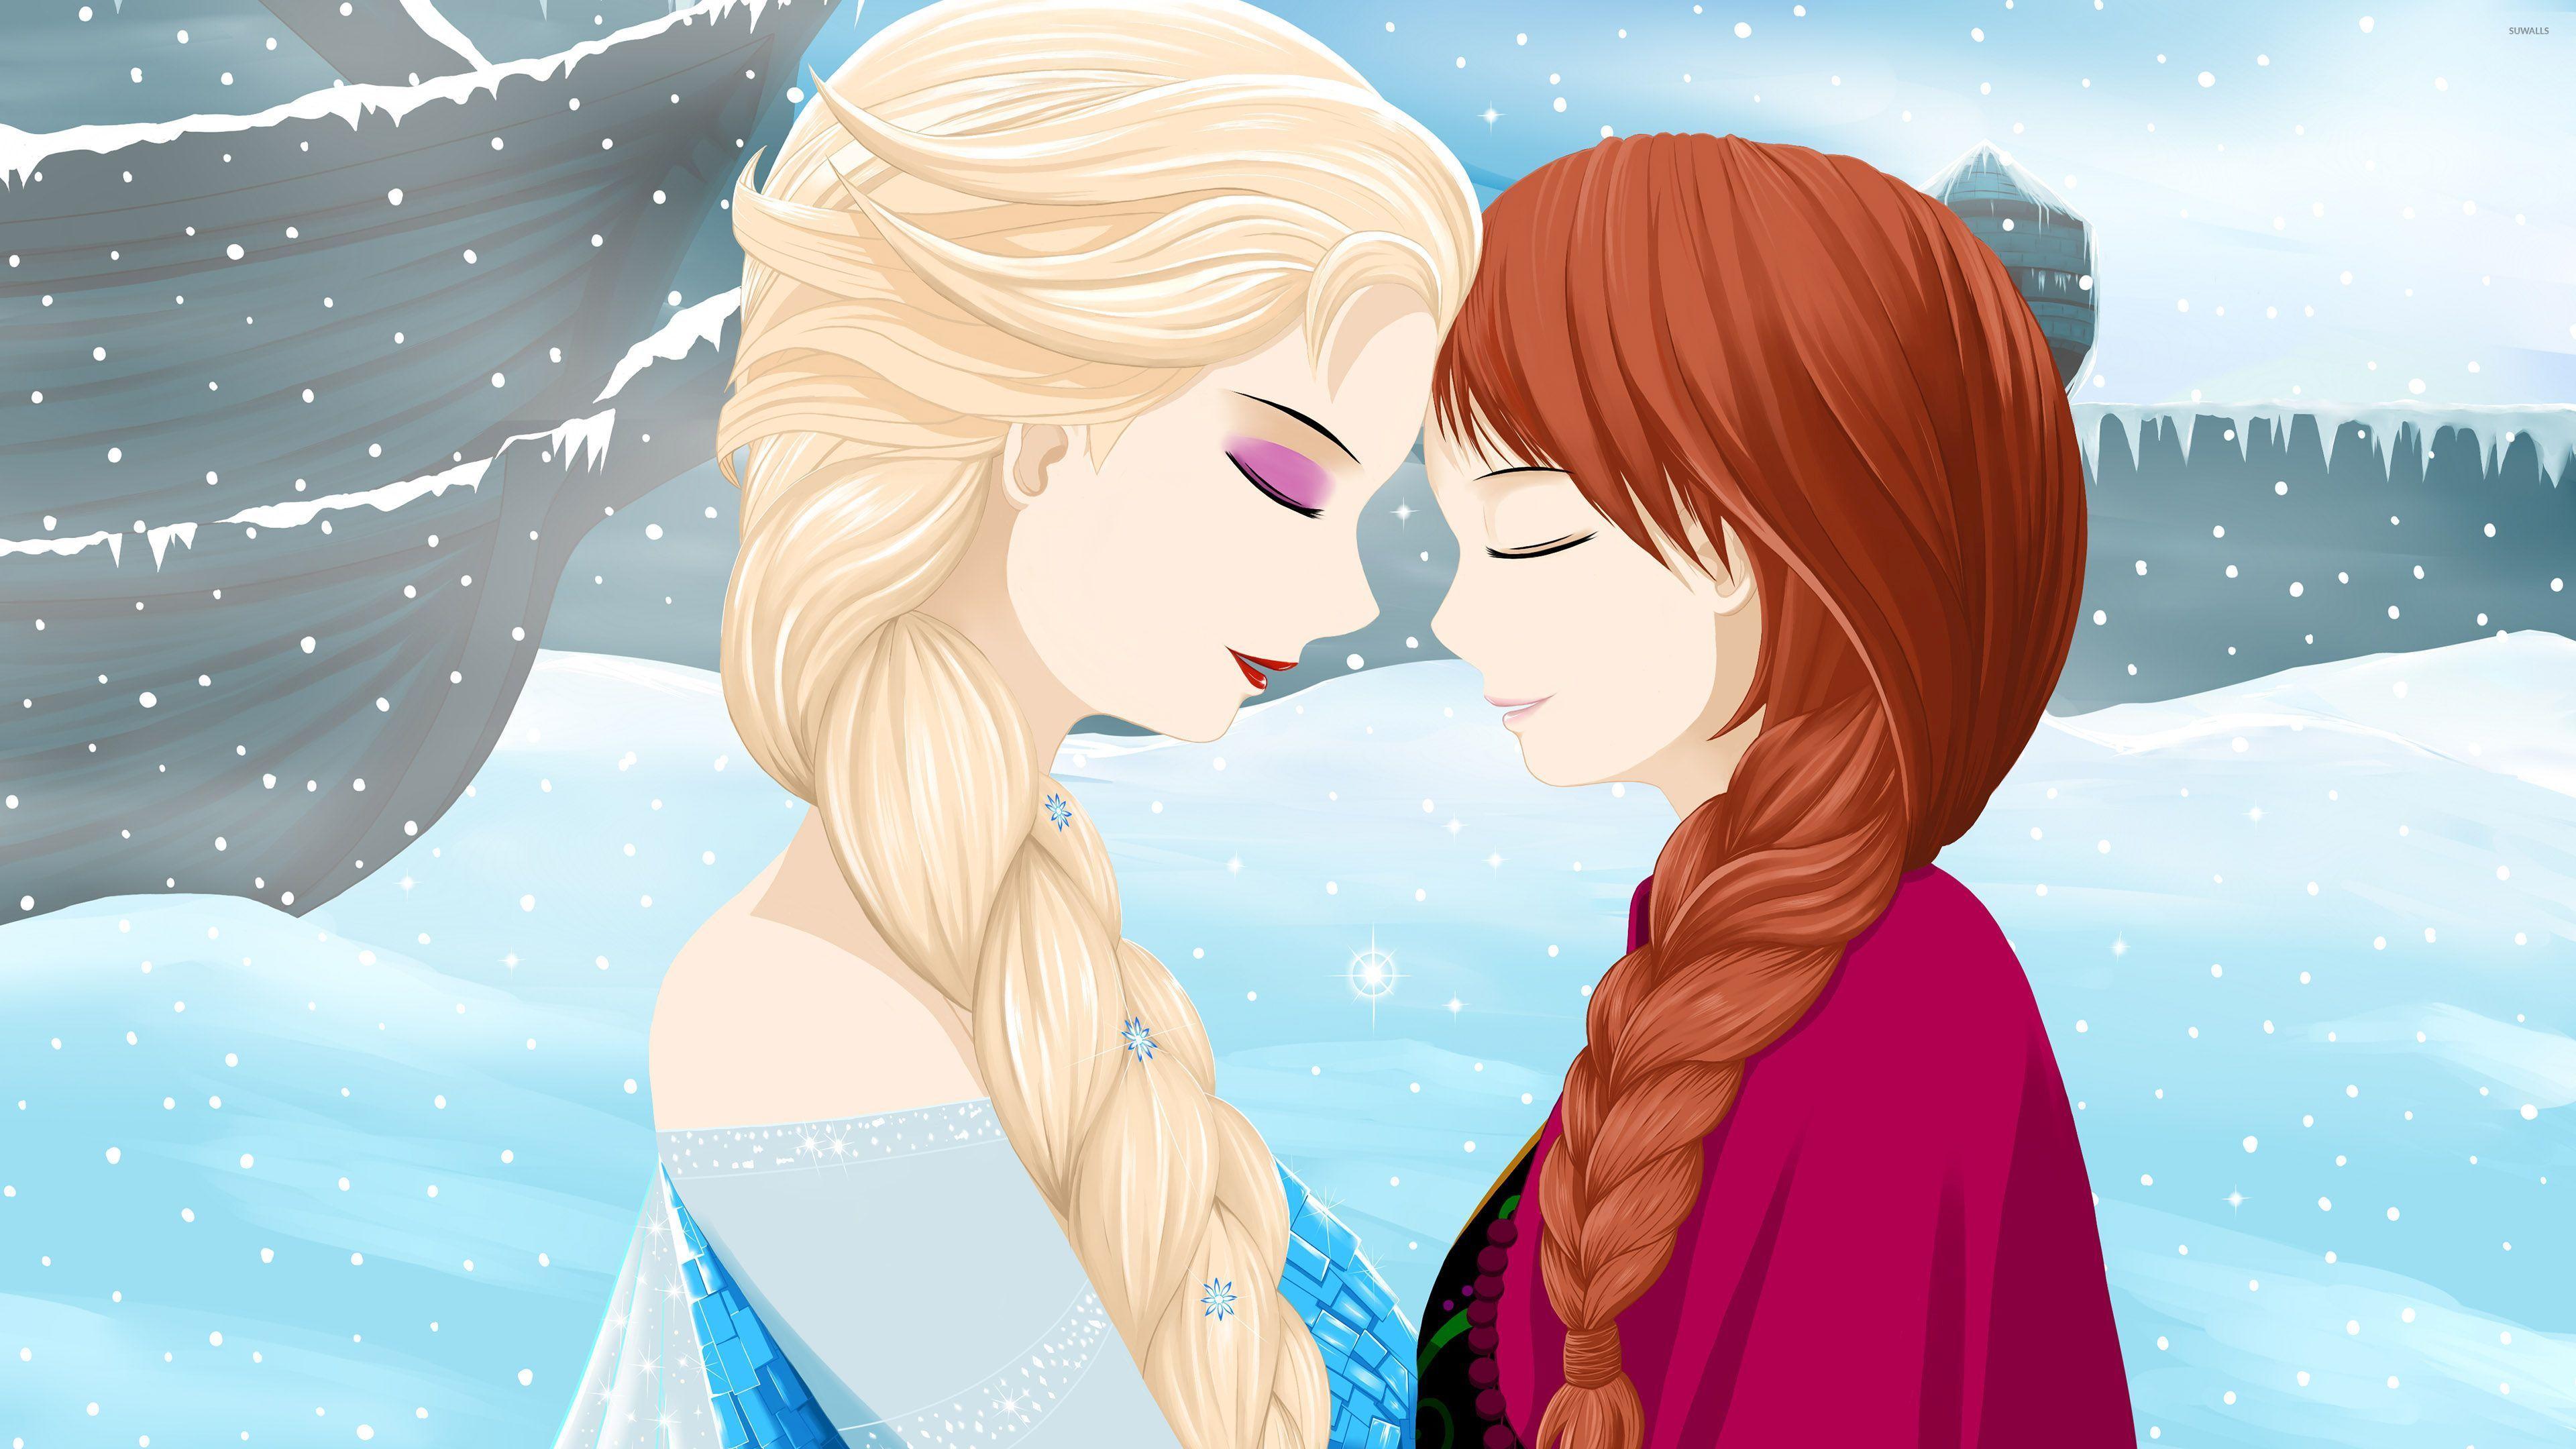 Elsa And Anna From Frozen Wallpaper Cartoon Wallpapers